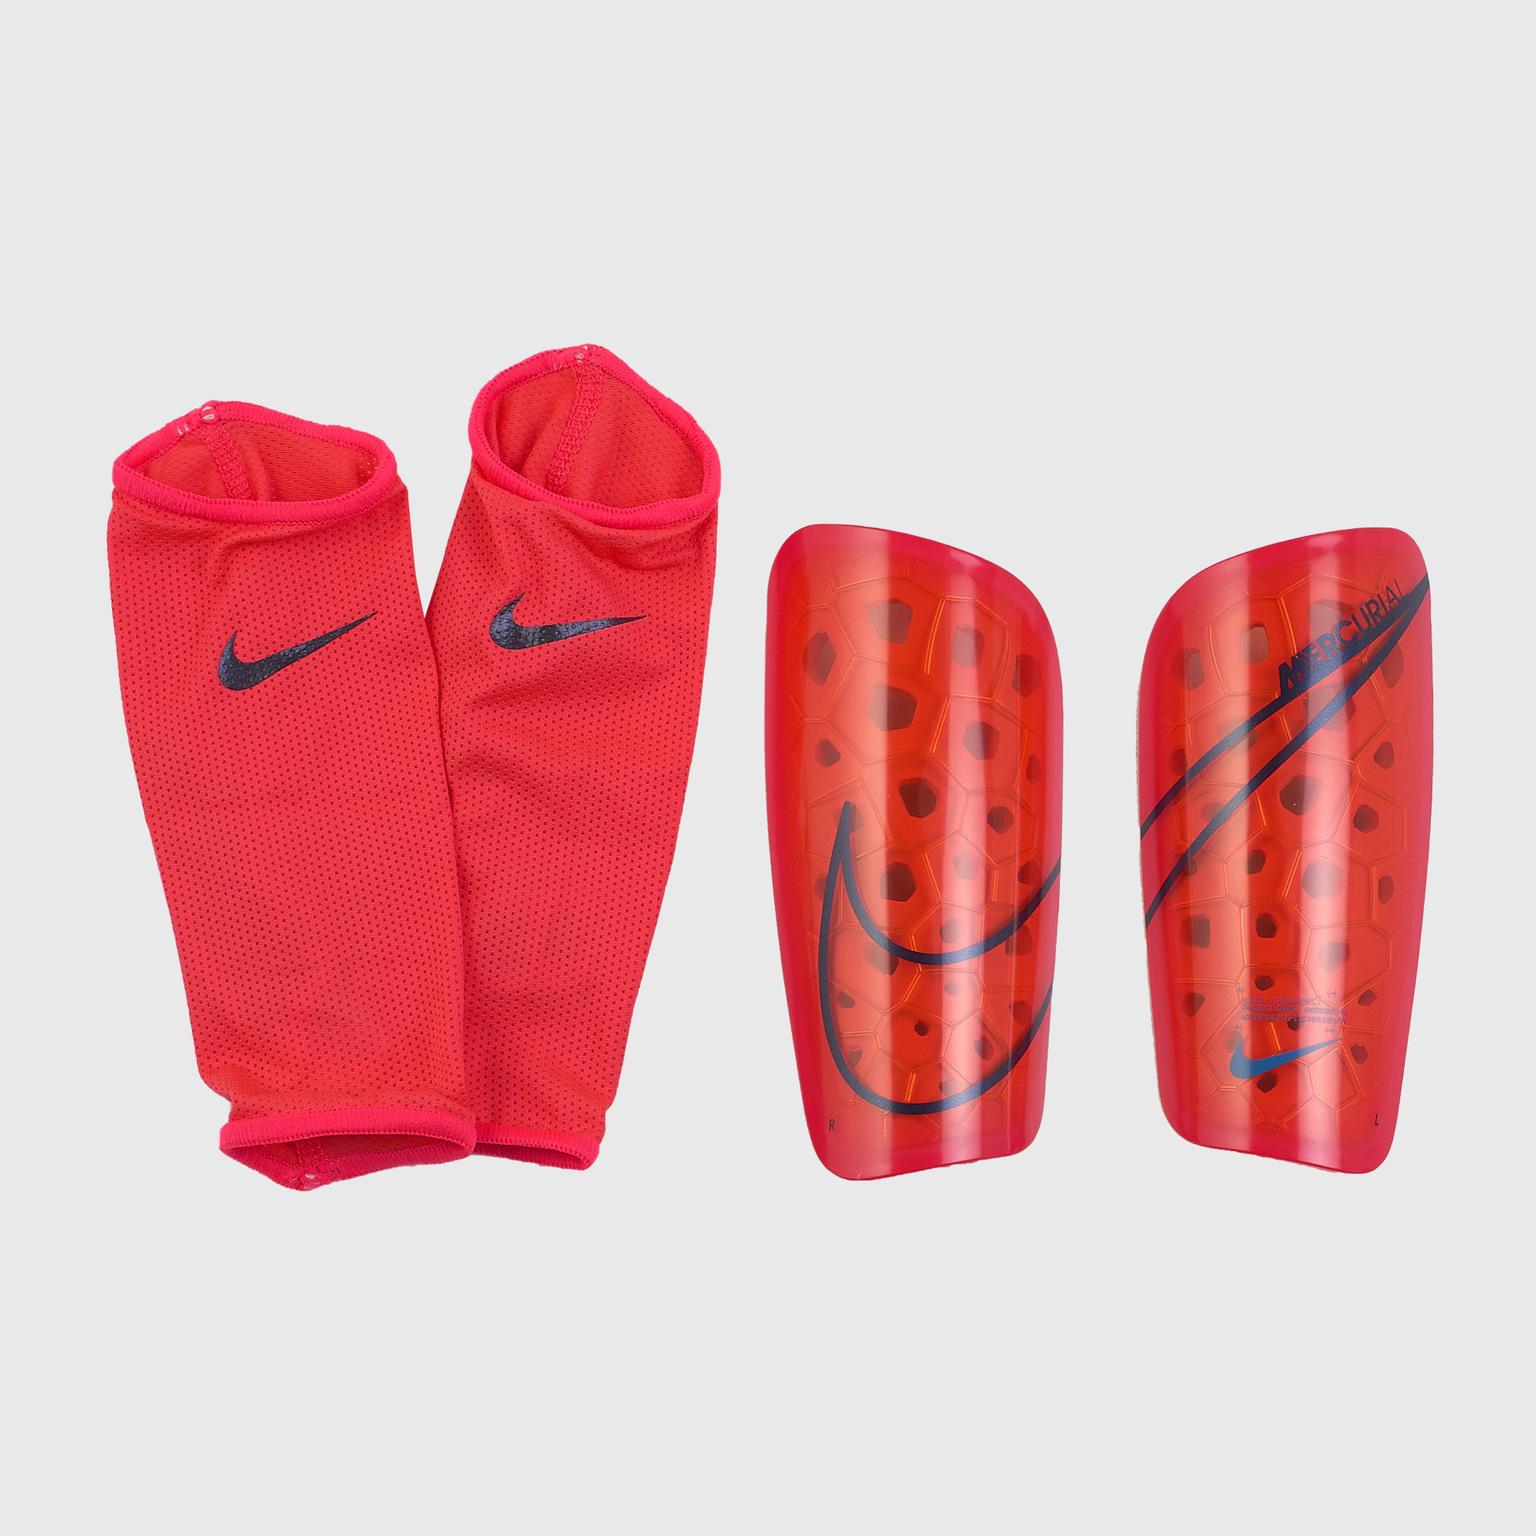 Щитки Nike Mercurial Lite GRD SP2120-644 щитки nike mercurial lite grd sp2120 704